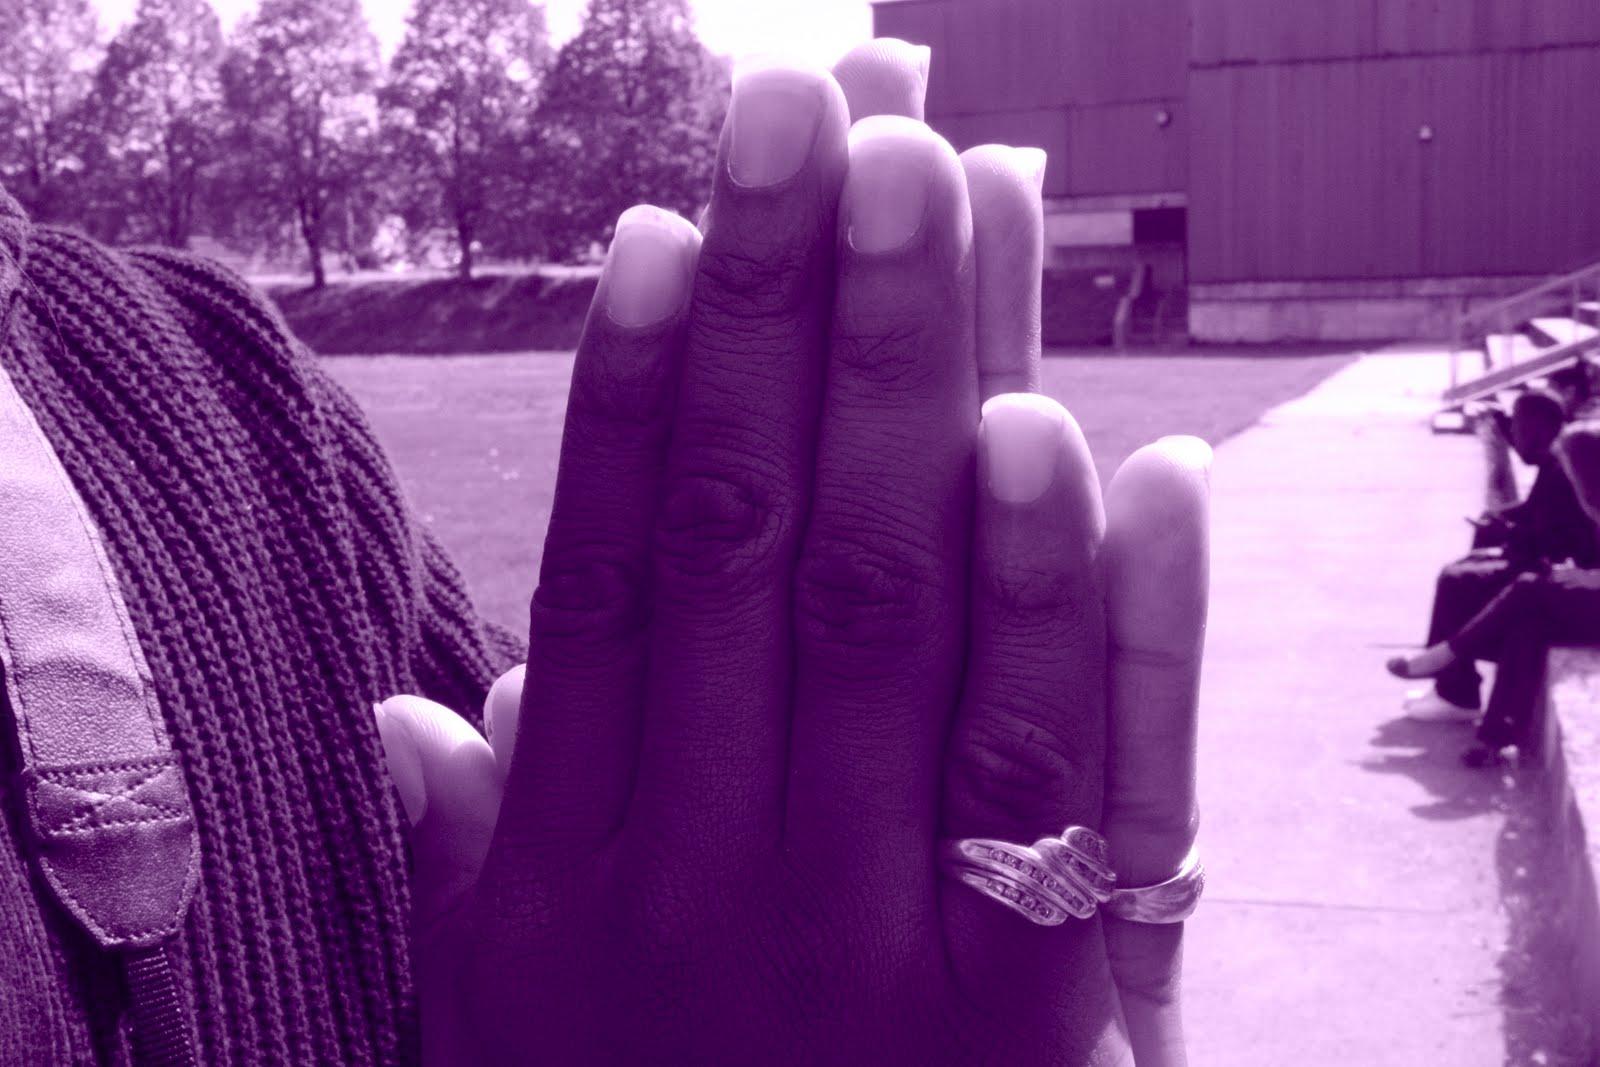 Takerras Photo The Color Purple Symbolism 5